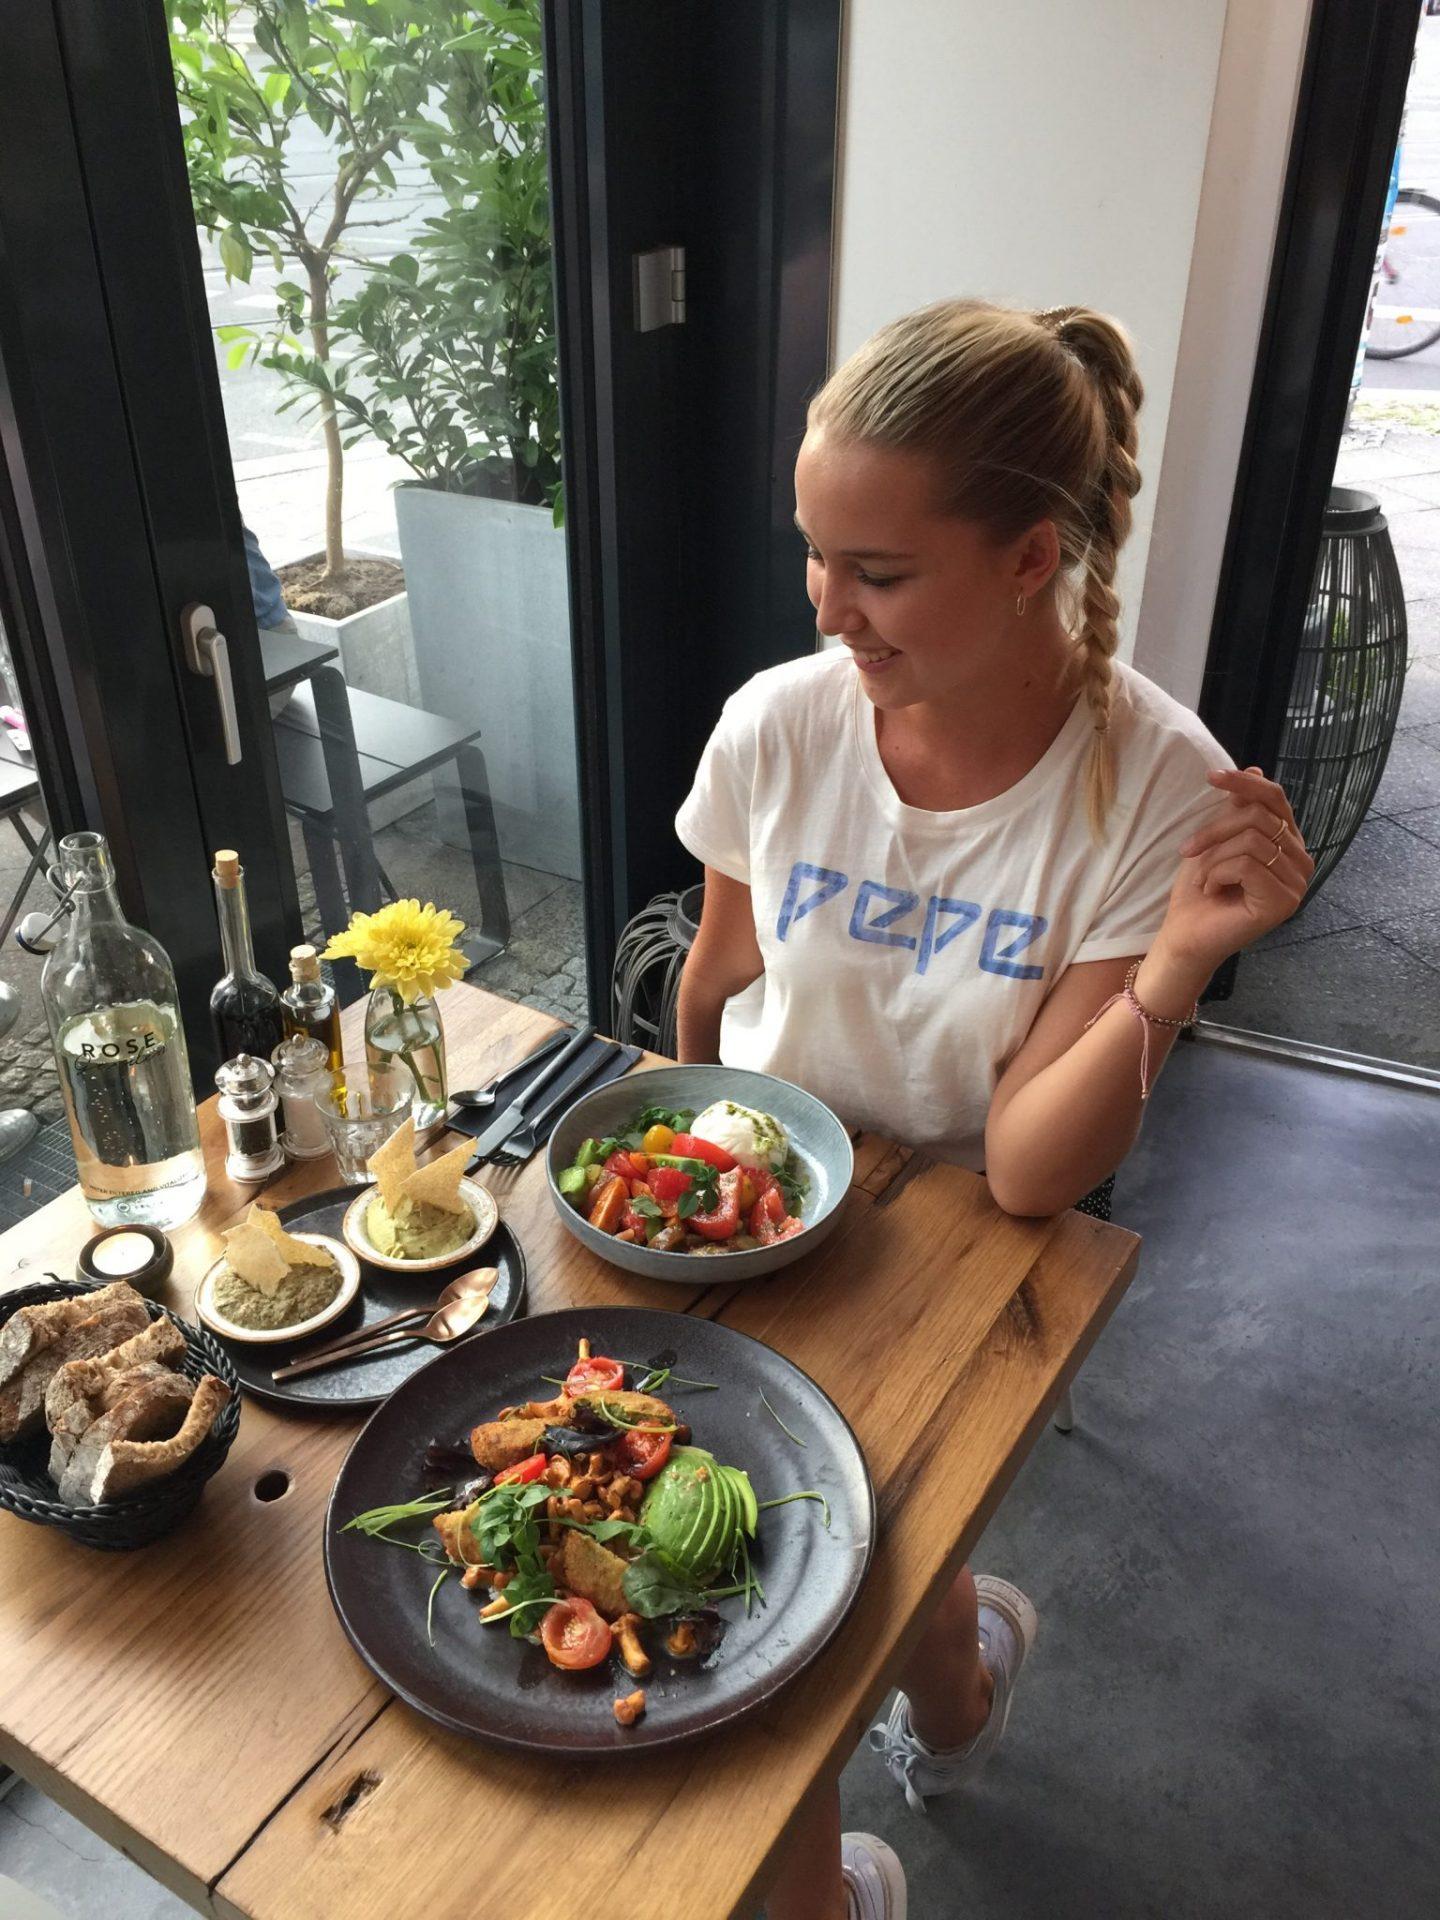 Restaurant Tipp Berlin rose Garden gesund vegan